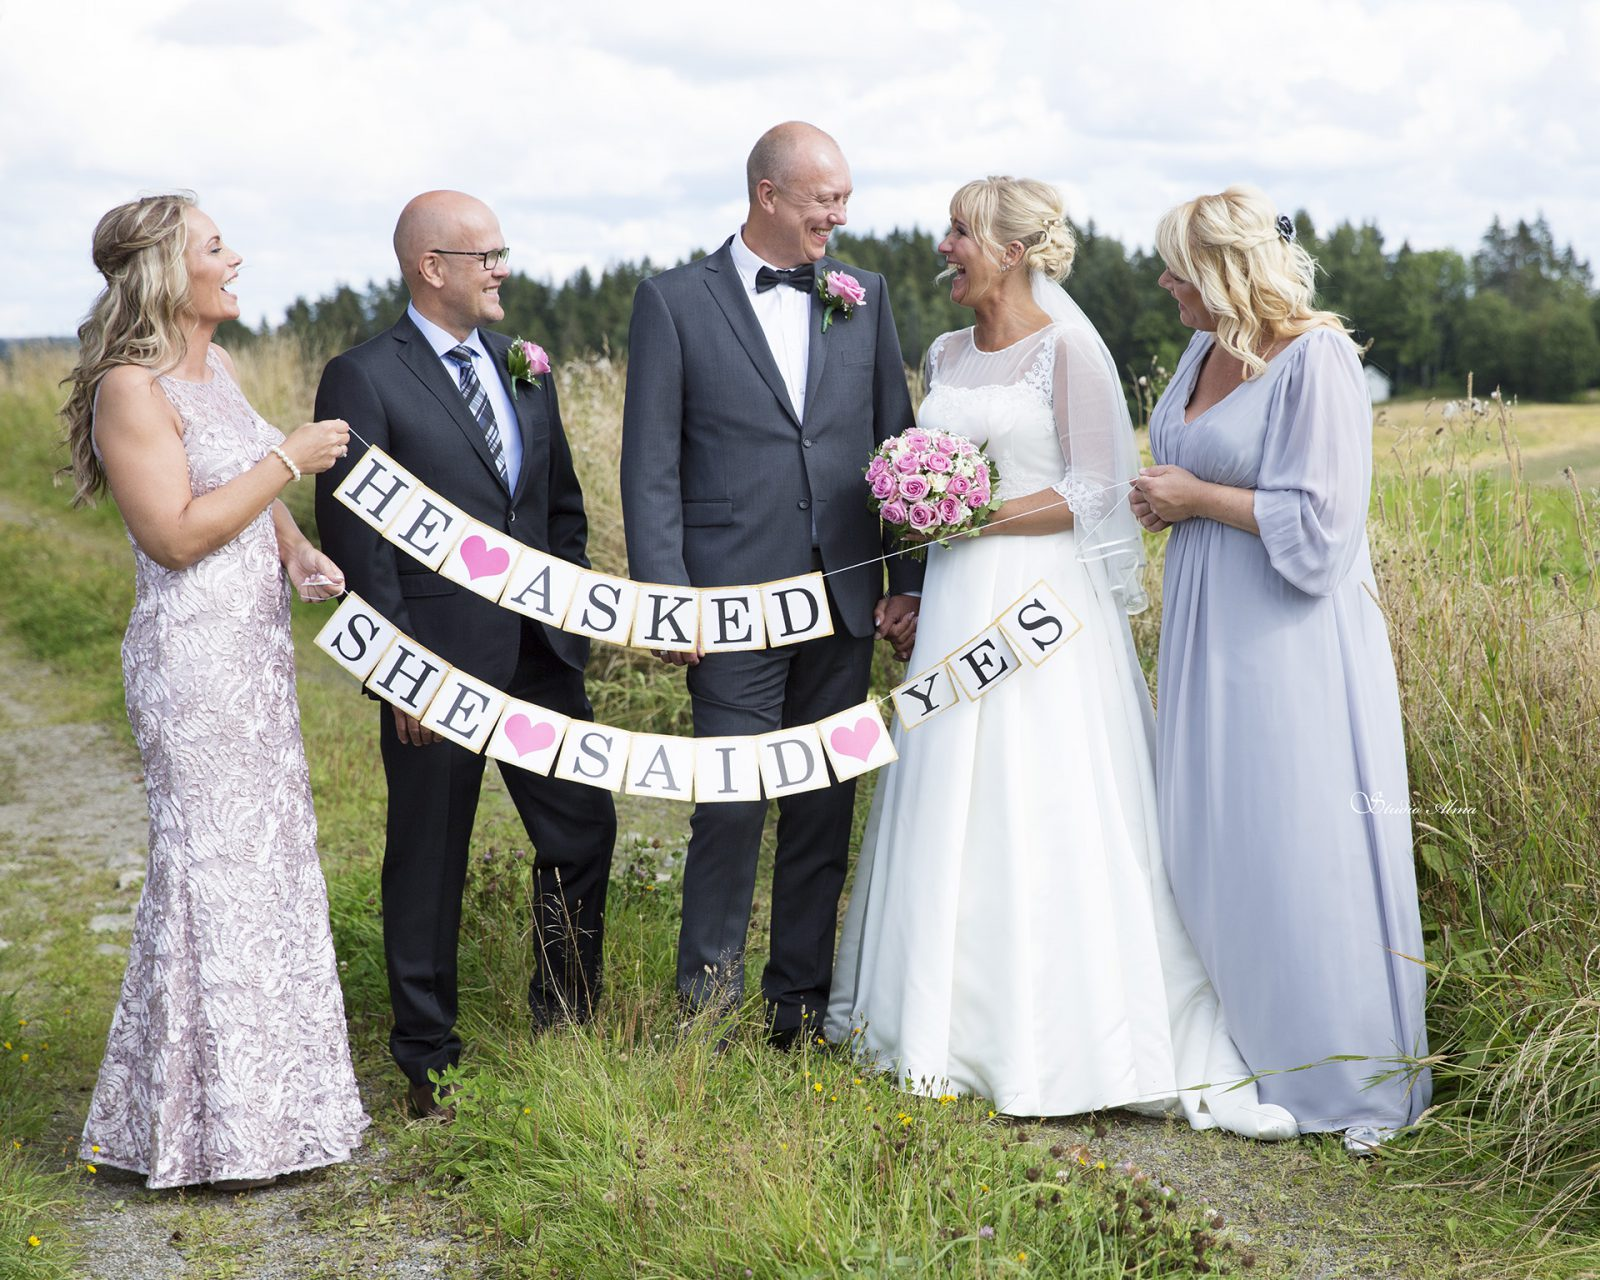 brudepar-forlovere-bryllup-studioalma